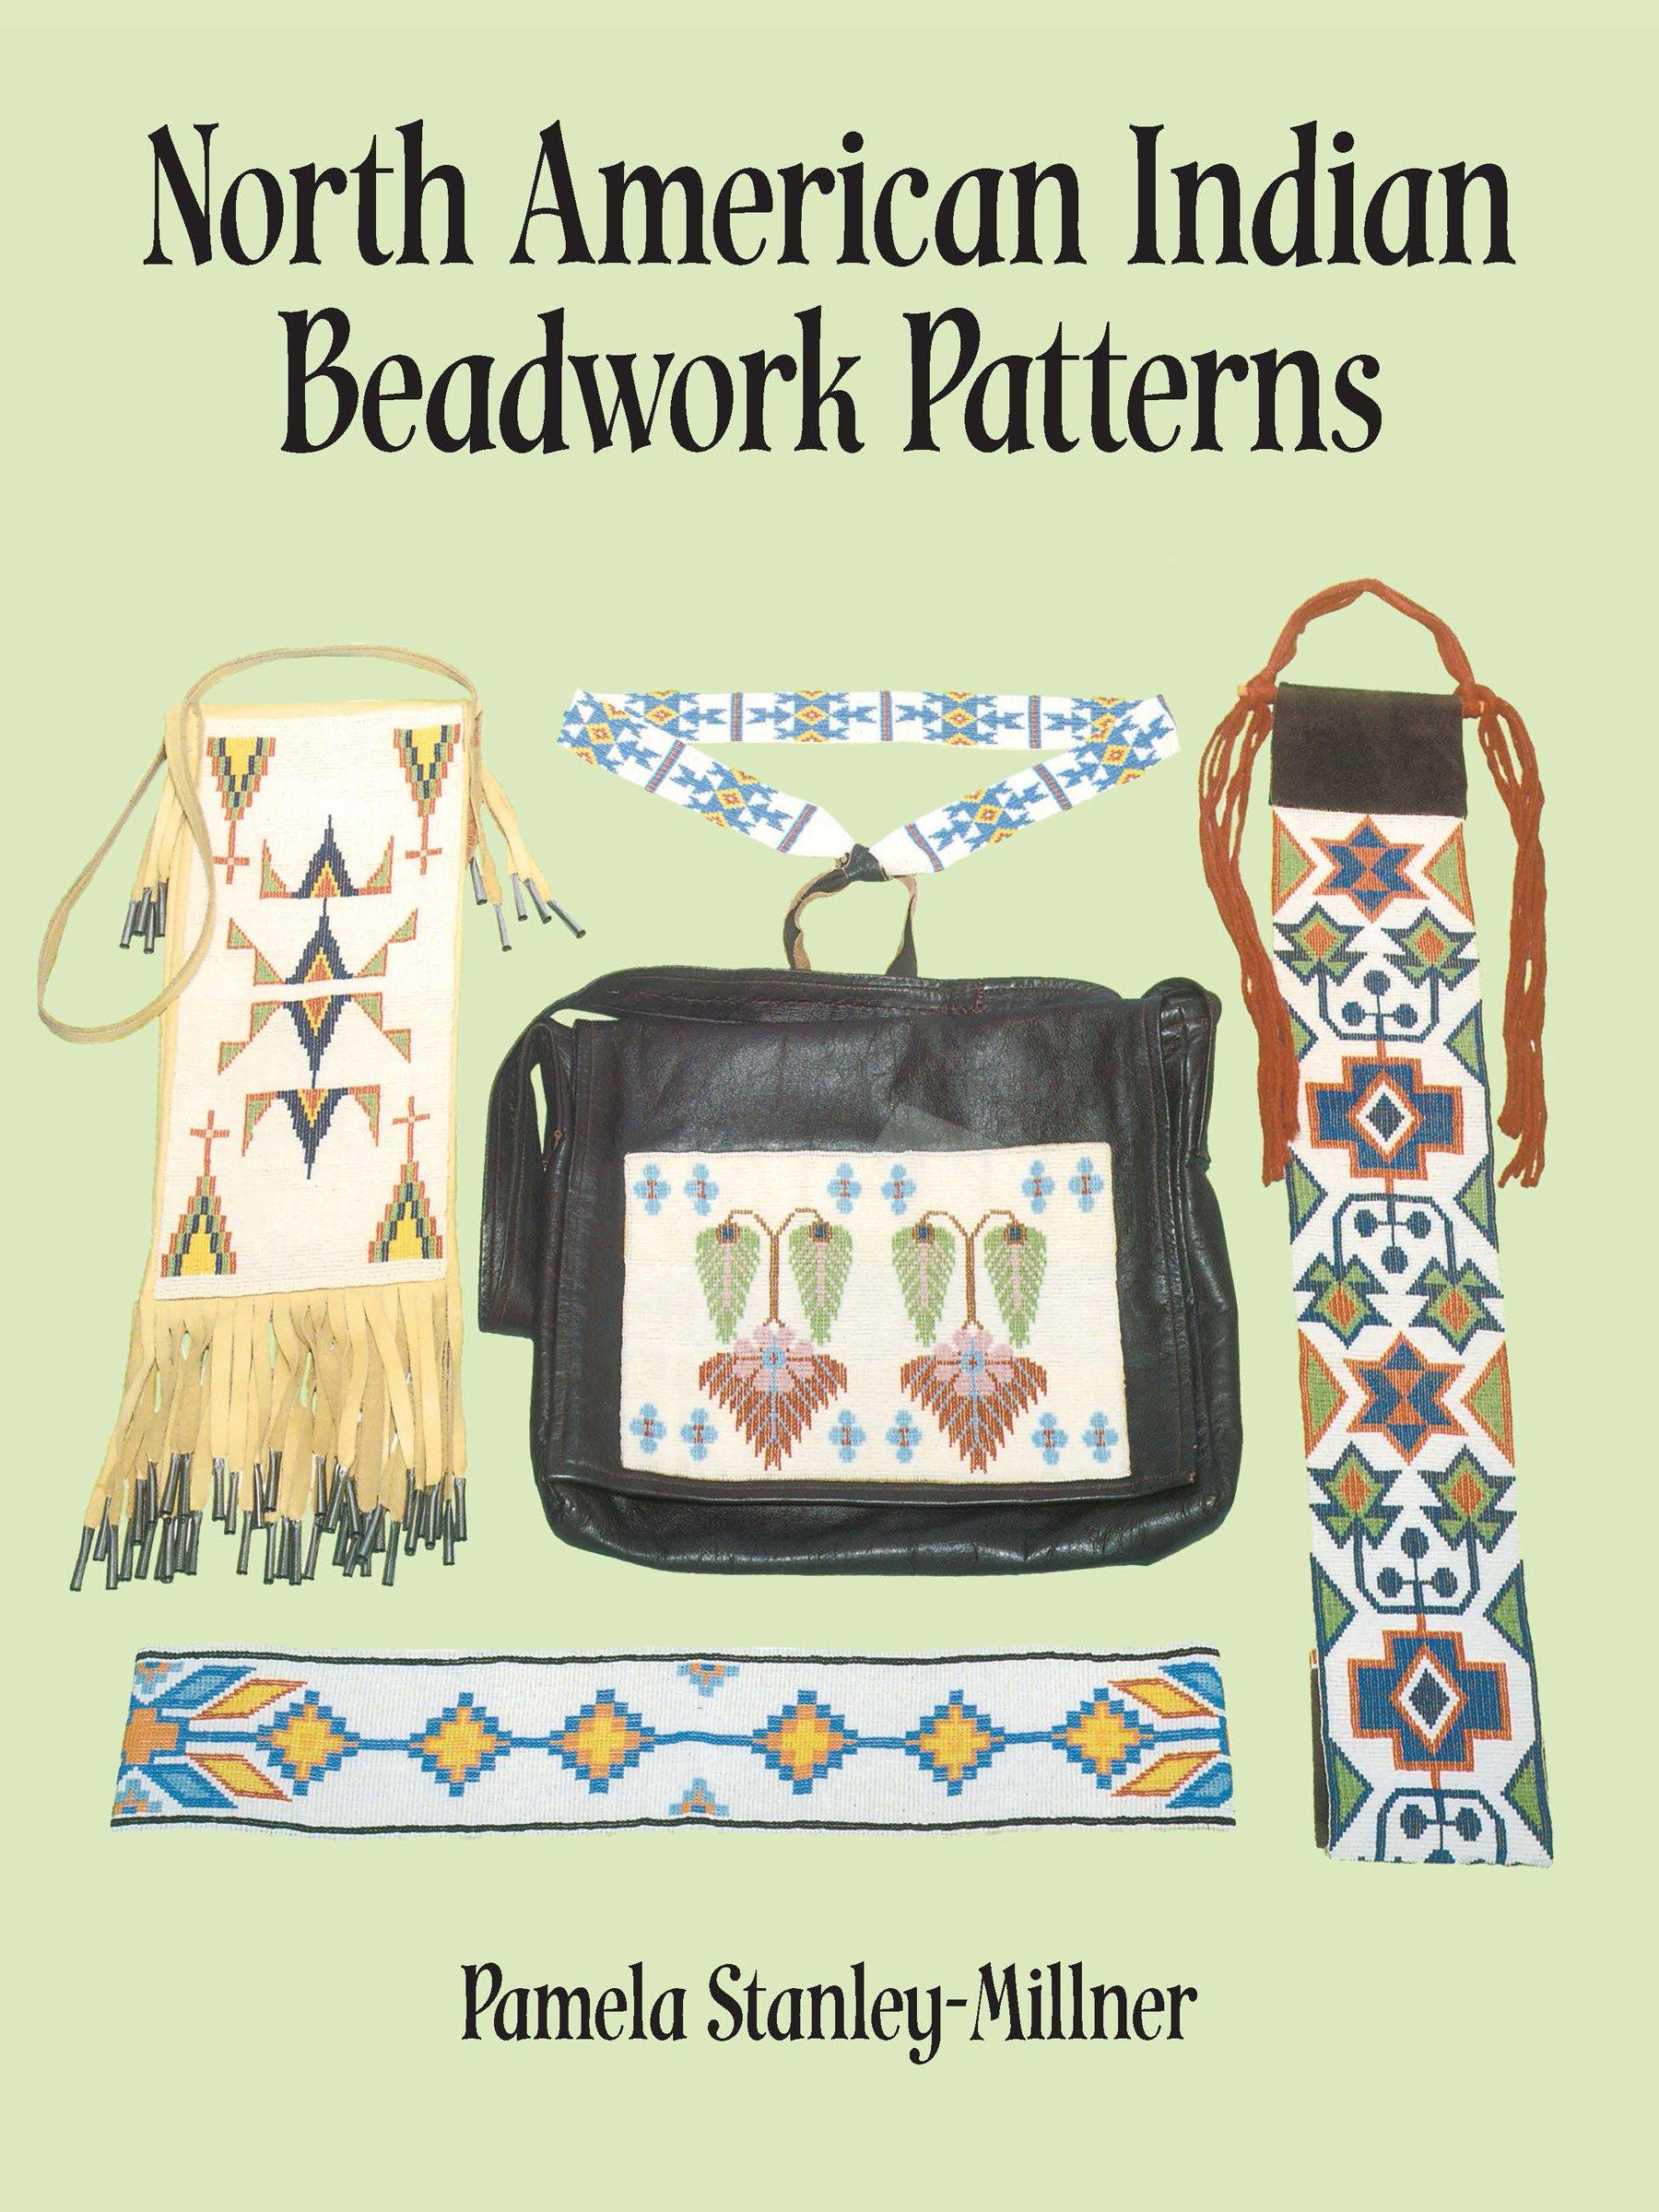 North American Indian Beadwork Patterns Pamela Stanley Millner